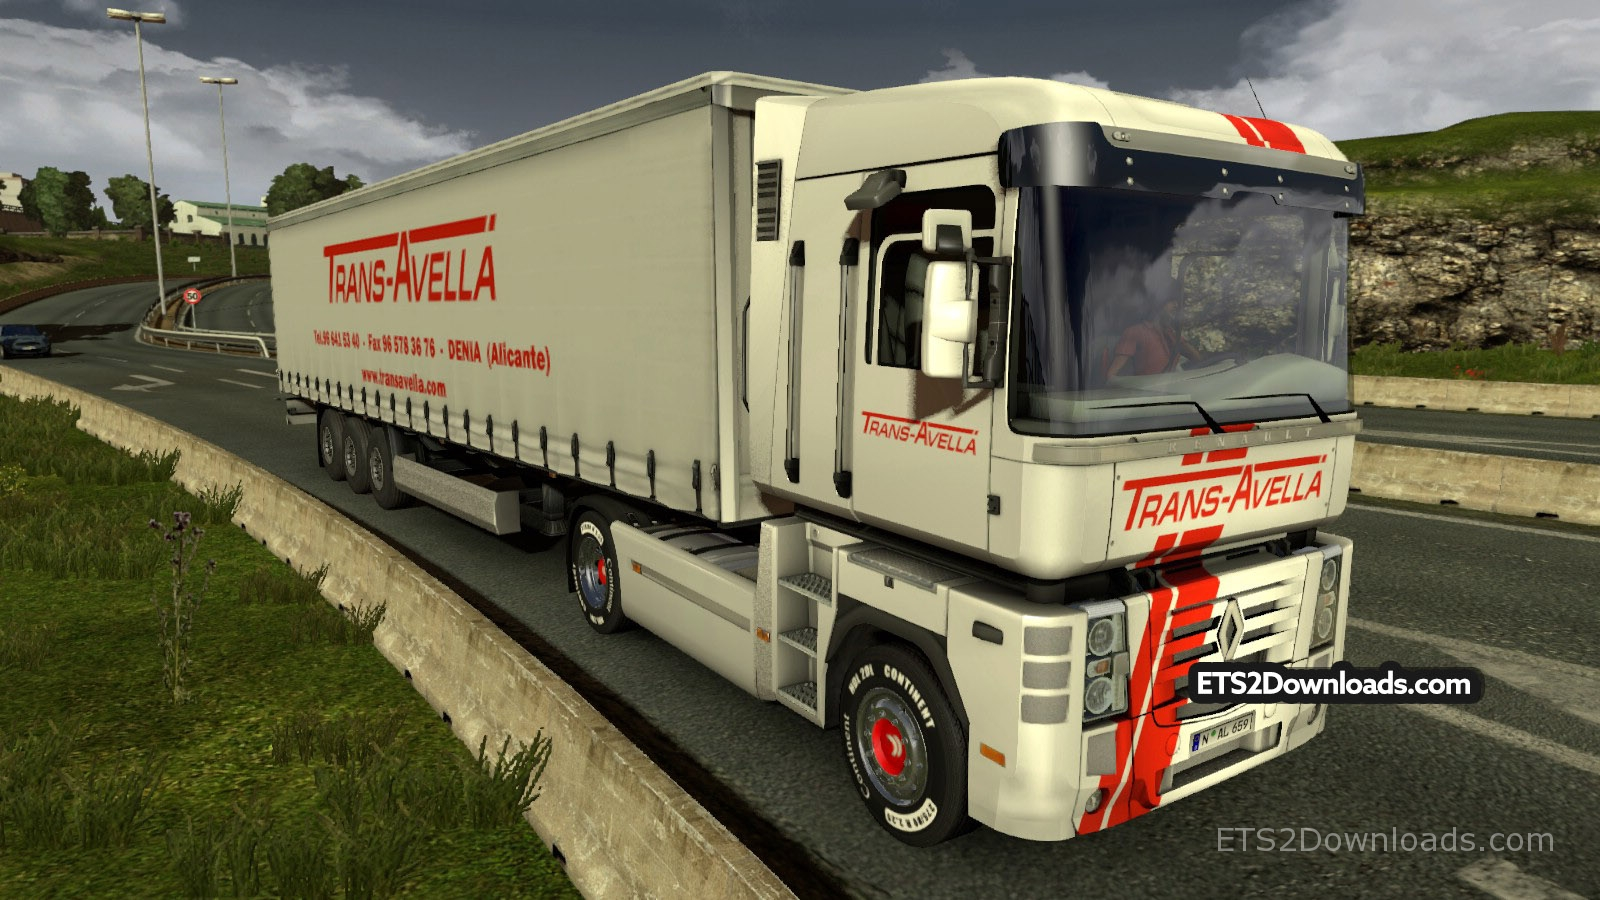 trans-avella-skin-trailer-for-renault-magnum